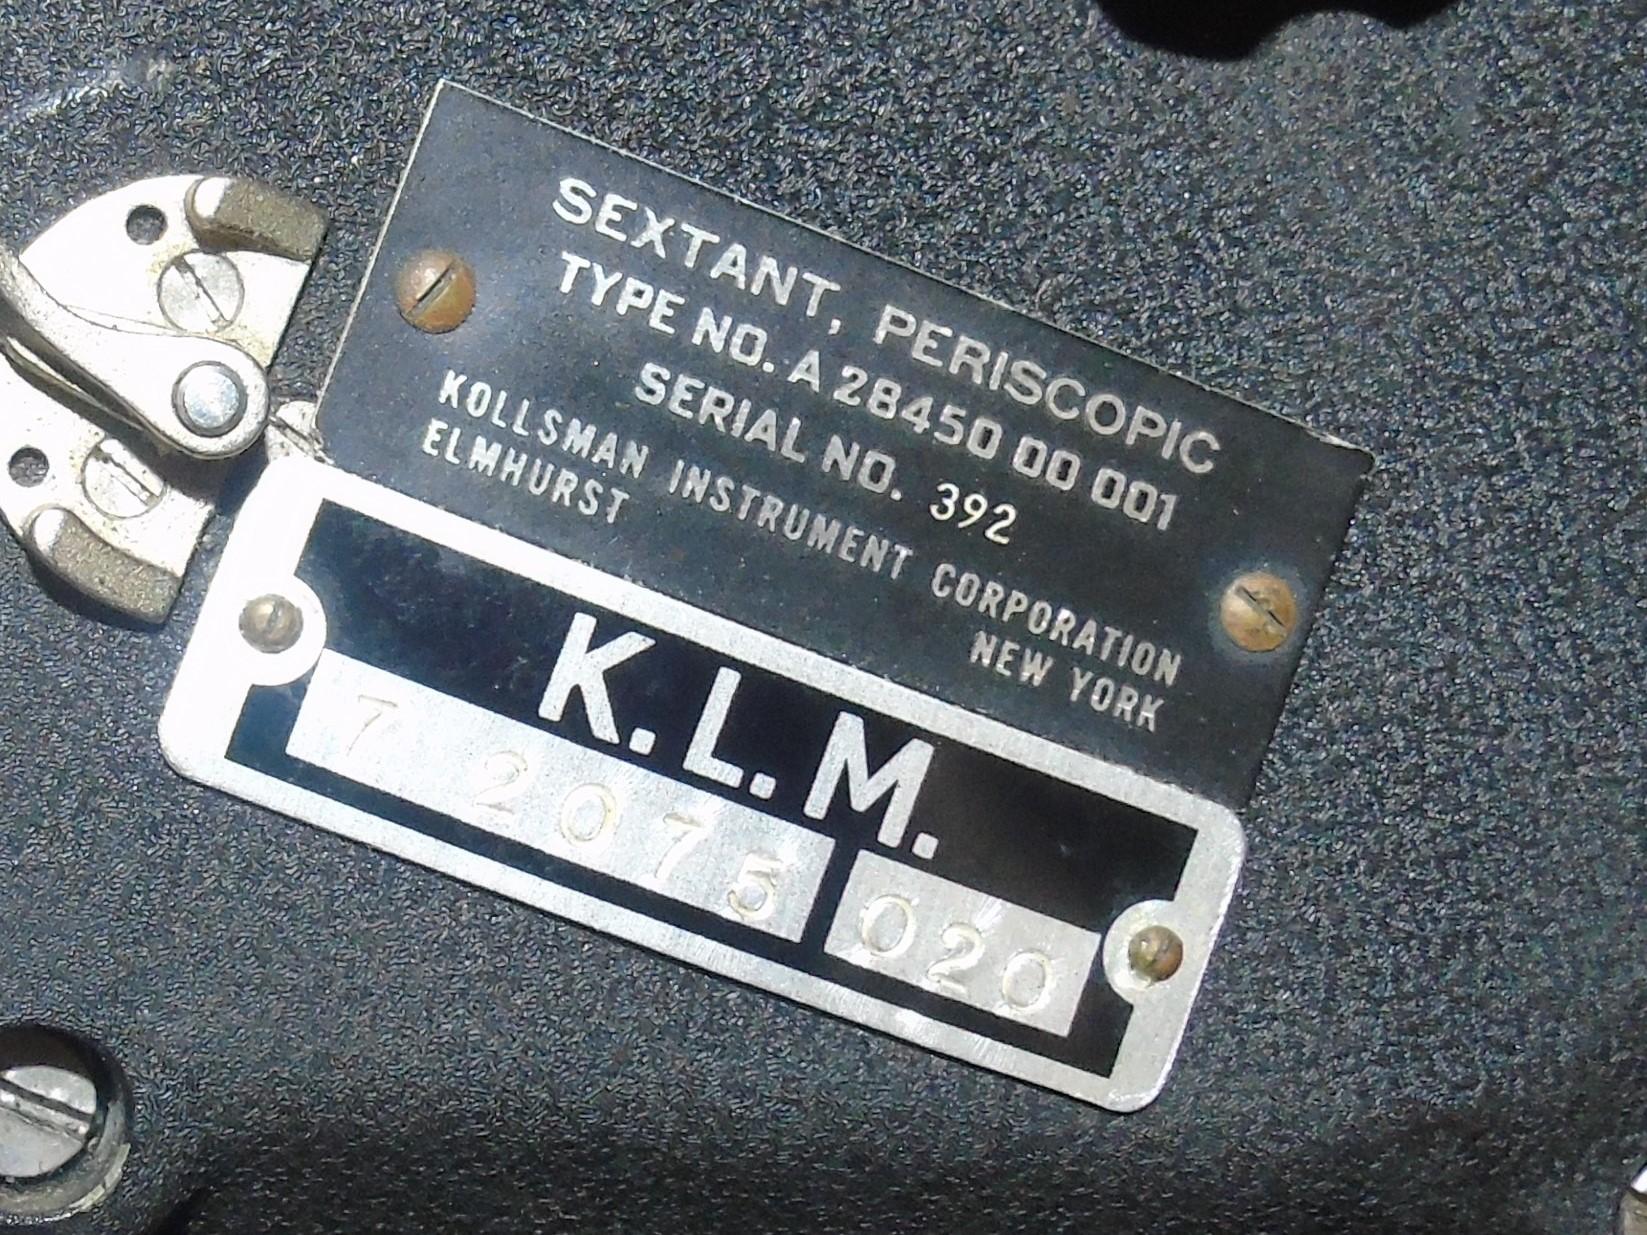 Lot 22 - COLD WAR ERA AIRCRAFT PERISCOPIC SEXTANT BY KOLLSMAN INSTRUMENTS CORP EST [£90-£130]